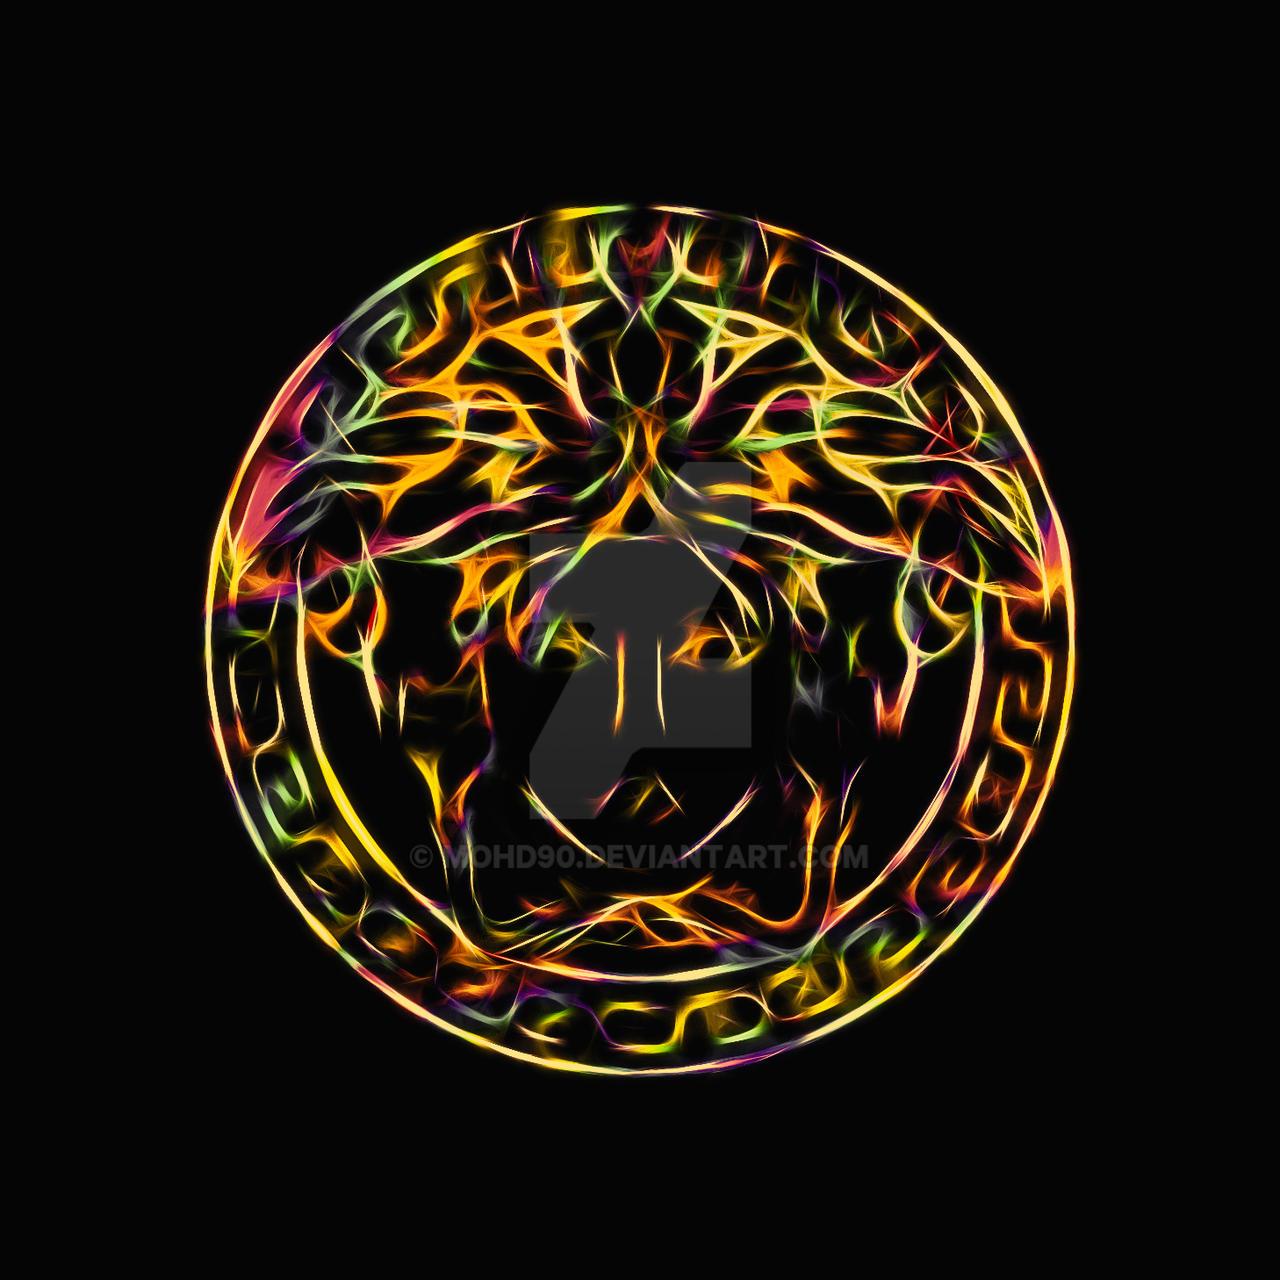 Versace Logo Wallpaper Black And Gold